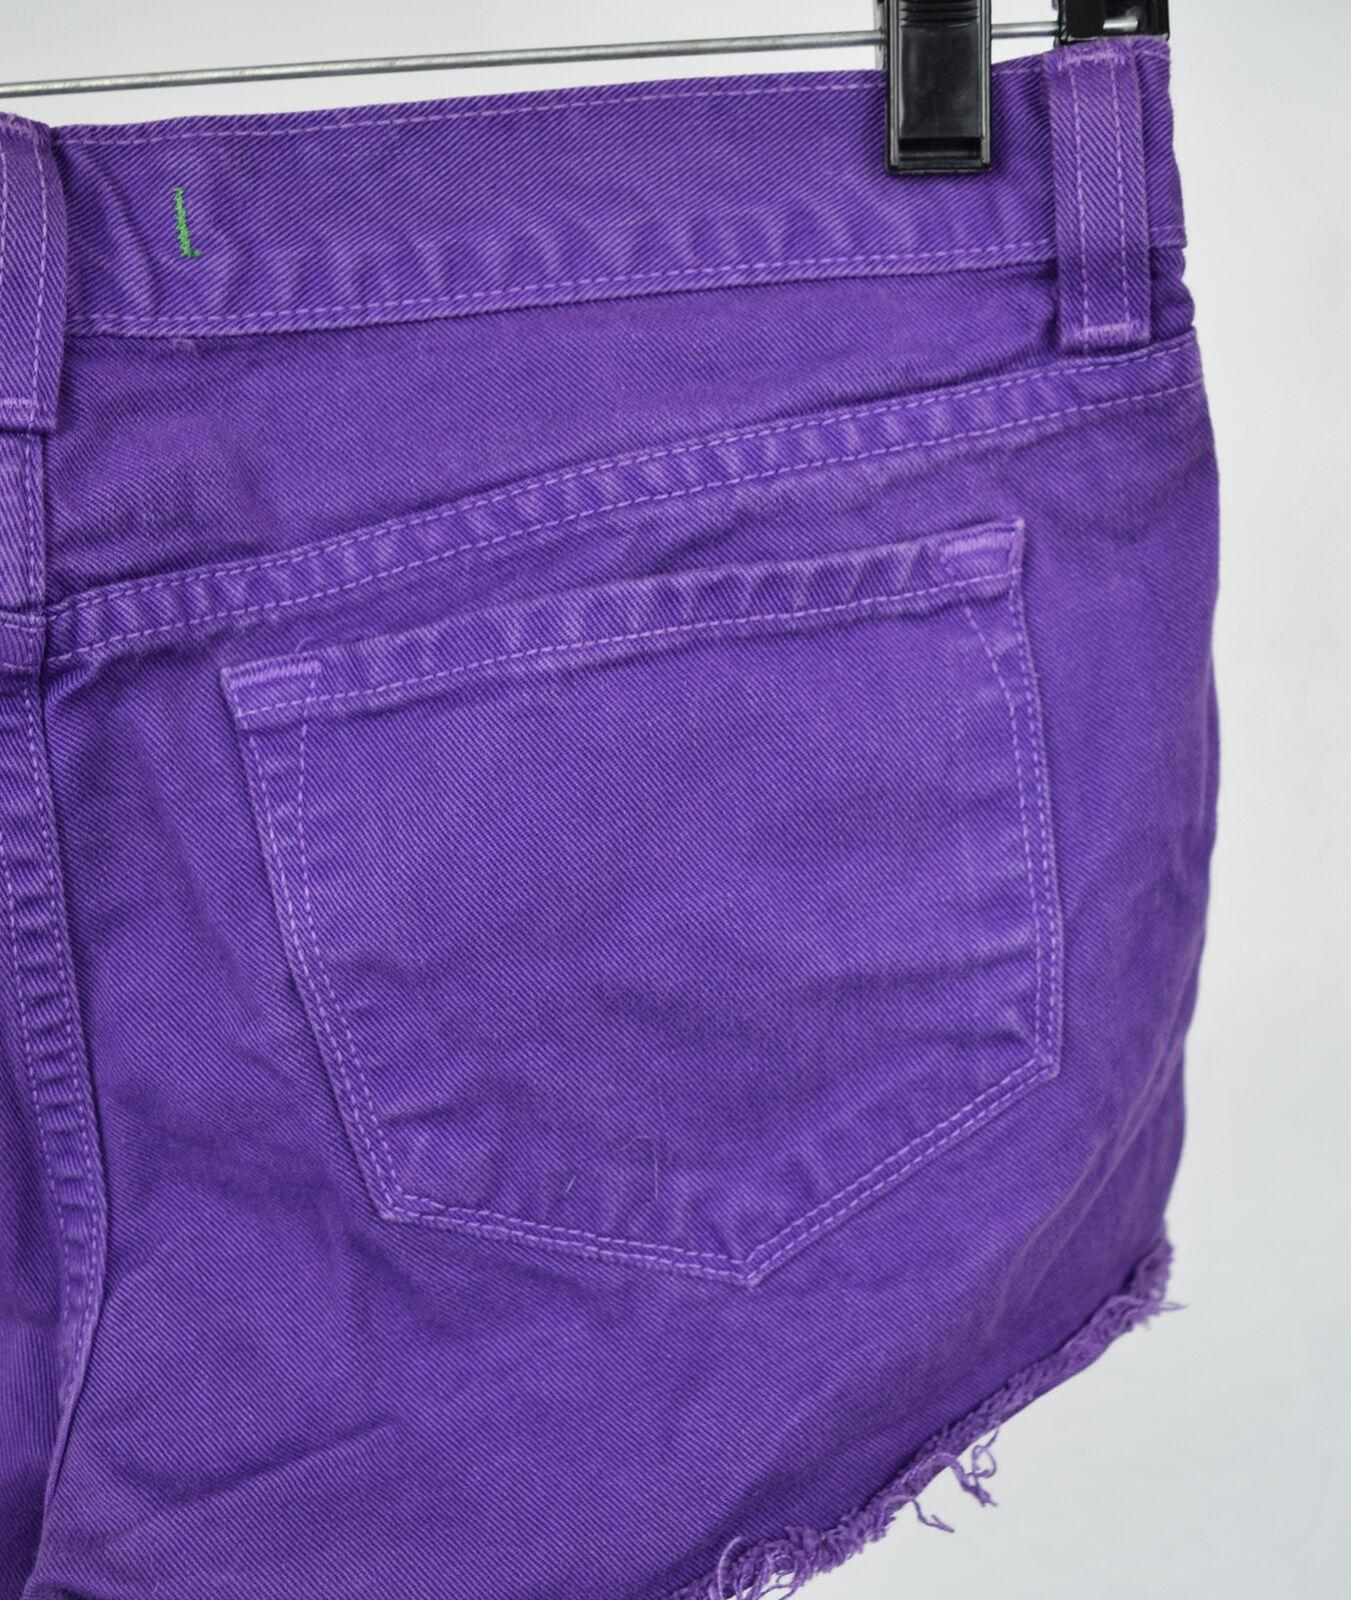 J Brand 7037 Bright Purple Cut Off Short Jeans 26 Womens USA image 10